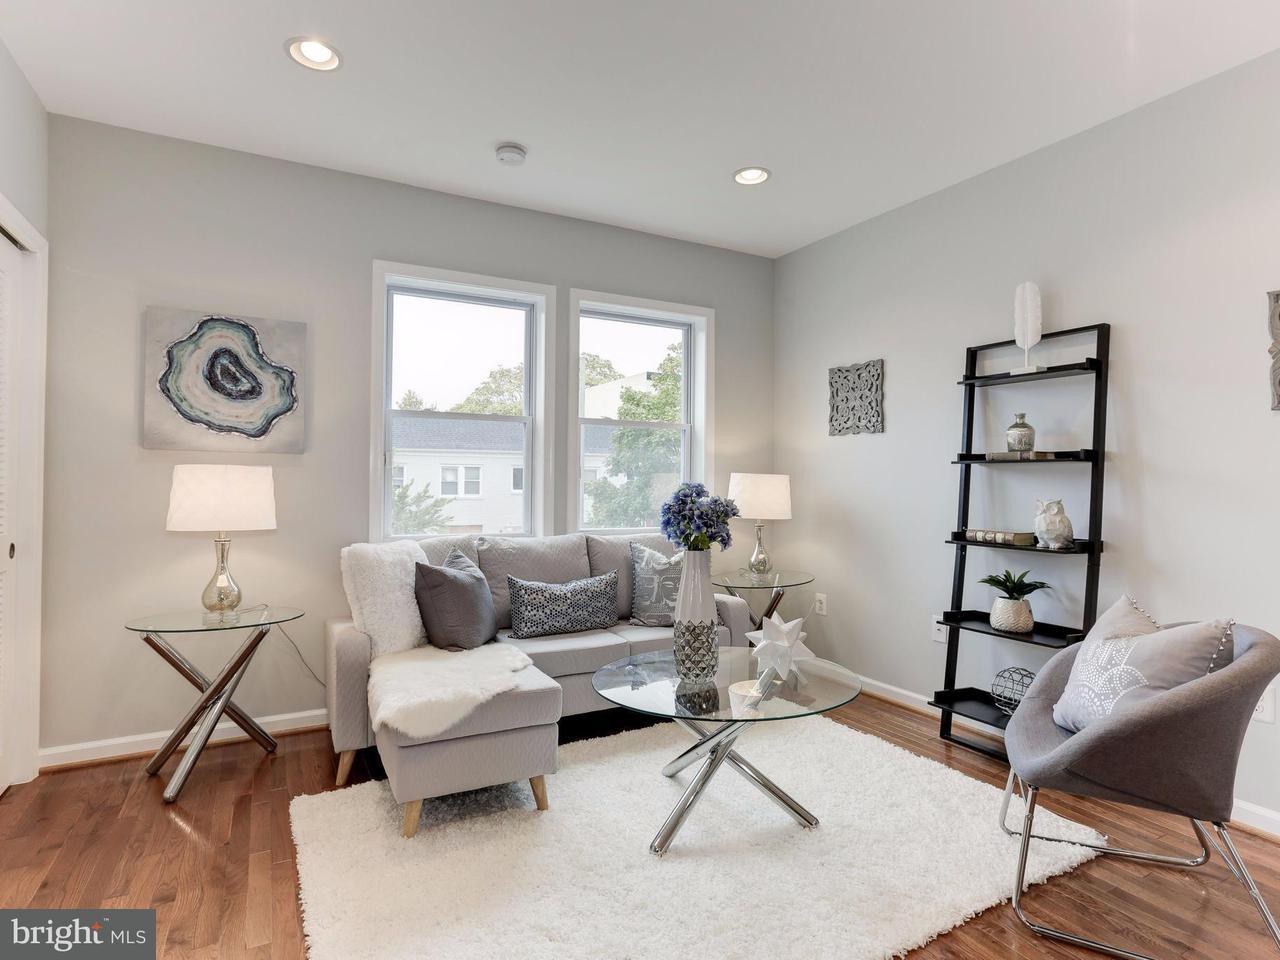 Condominium for Sale at 1617 E St NE #1 Washington, District Of Columbia 20002 United States